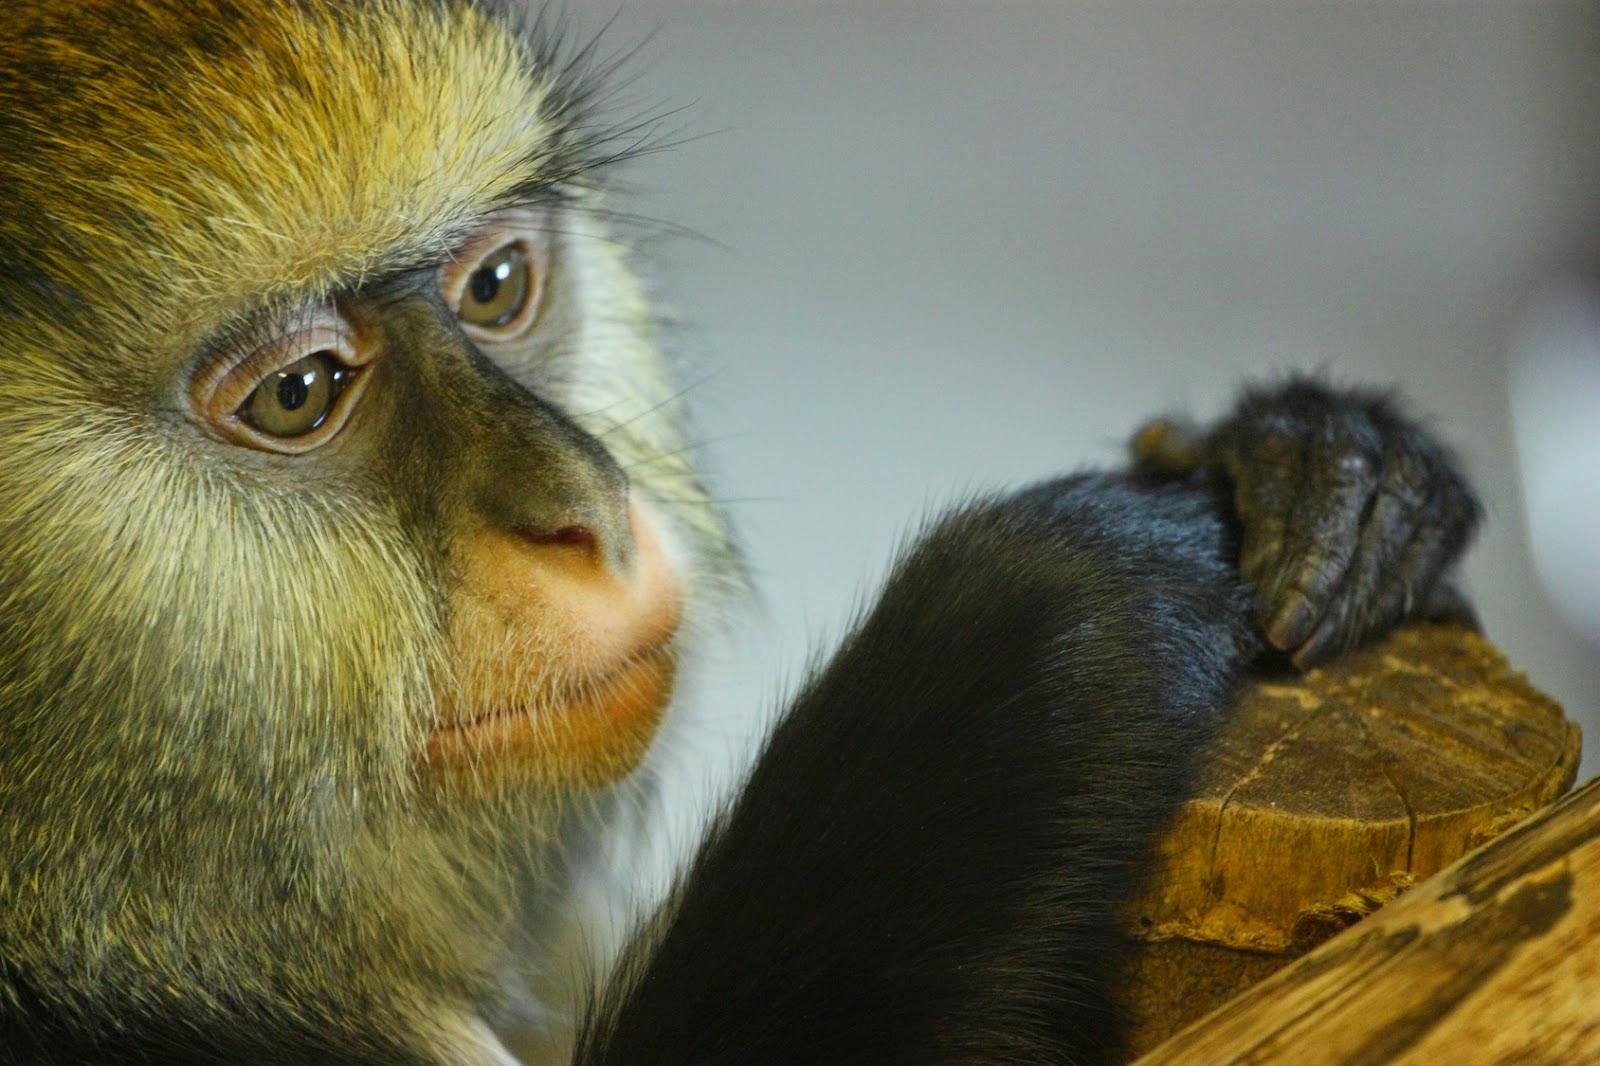 Fun Animals Wiki, Videos, Pictures, Stories: Do Monkeys